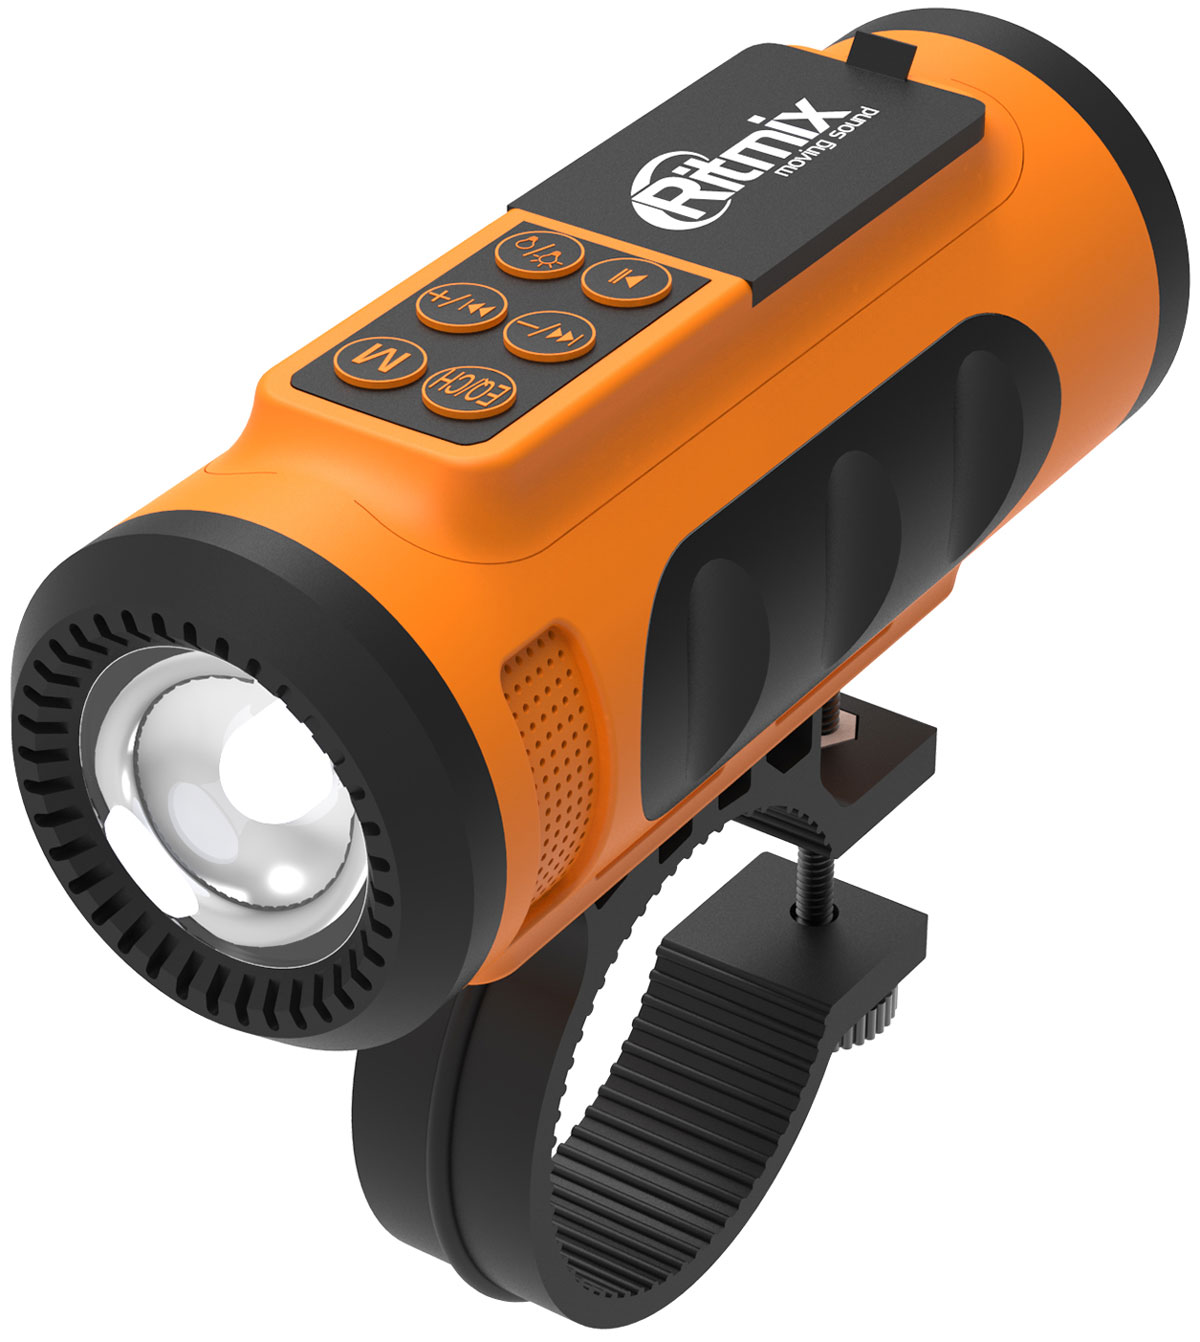 Canon PowerShot SX60 HS цифровая фотокамера